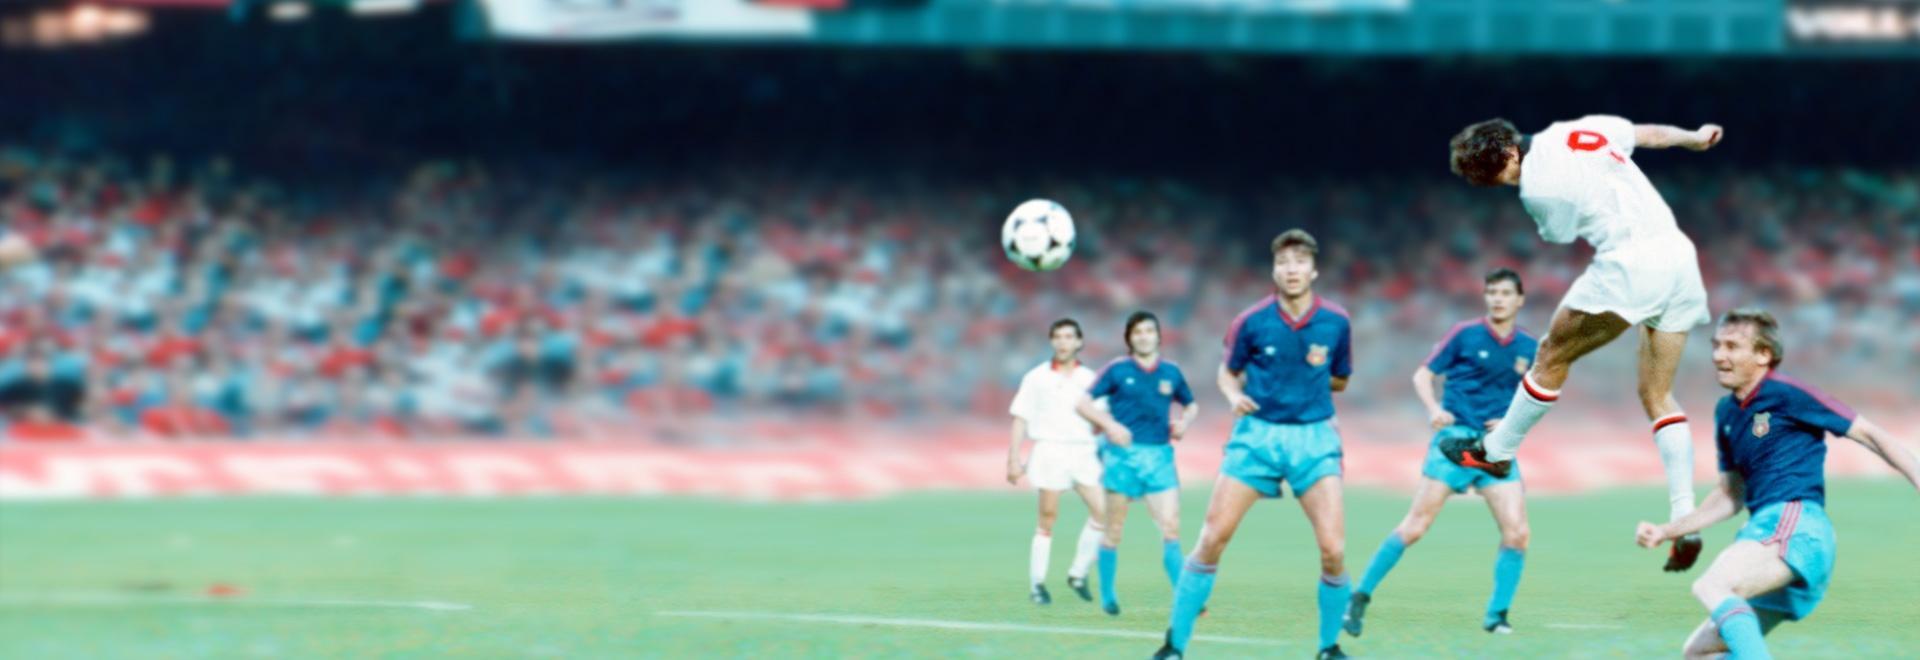 Milan 1989: quando diventammo Re